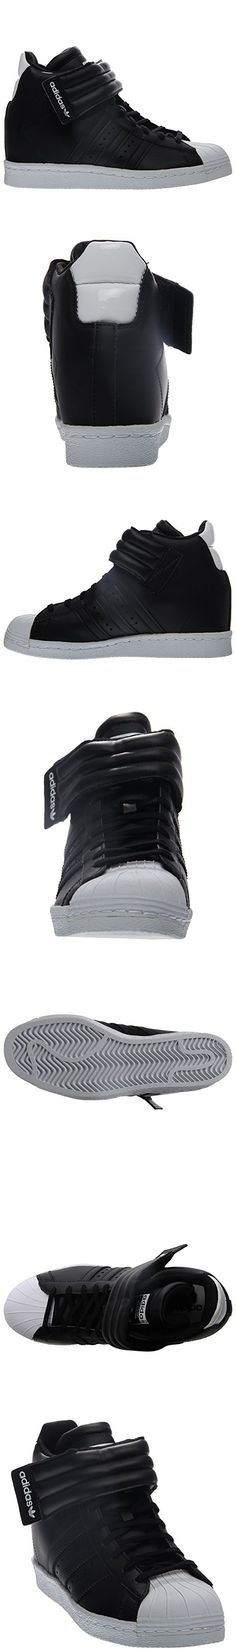 Adidas Neo Kohl&s